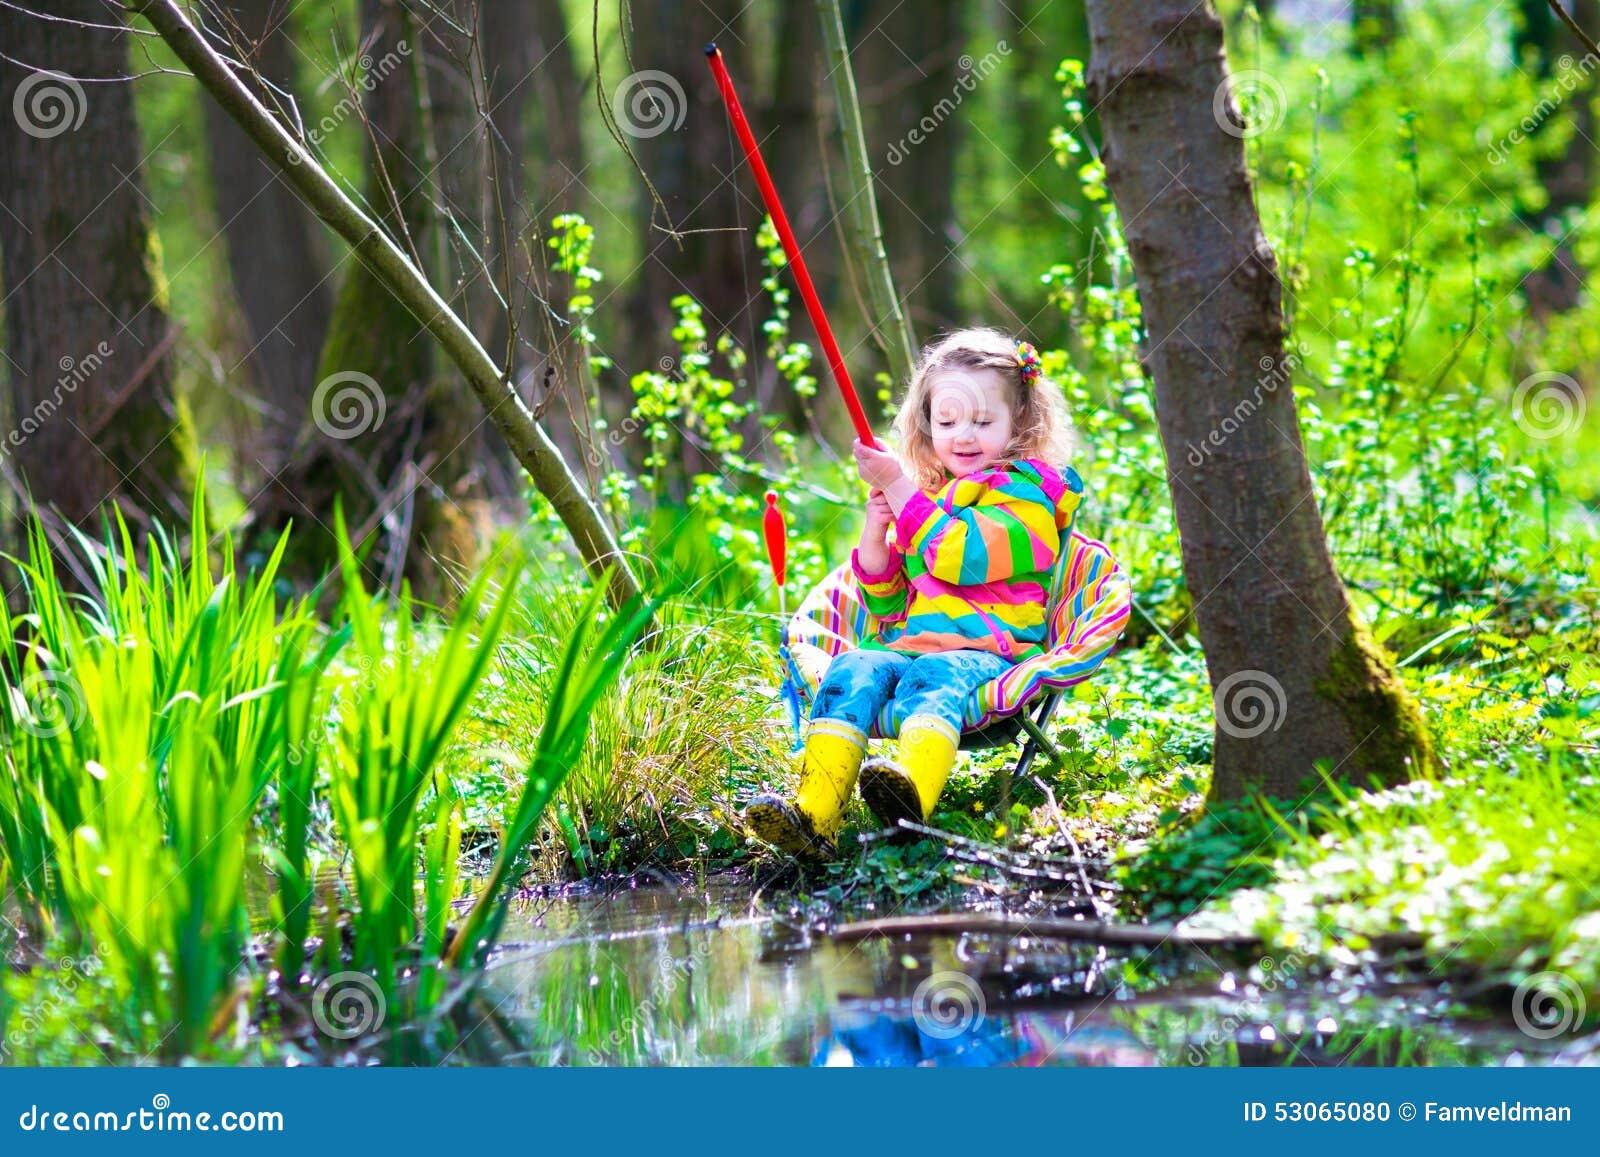 Little girl fishing stock photo image 53065080 for Little kid fishing pole